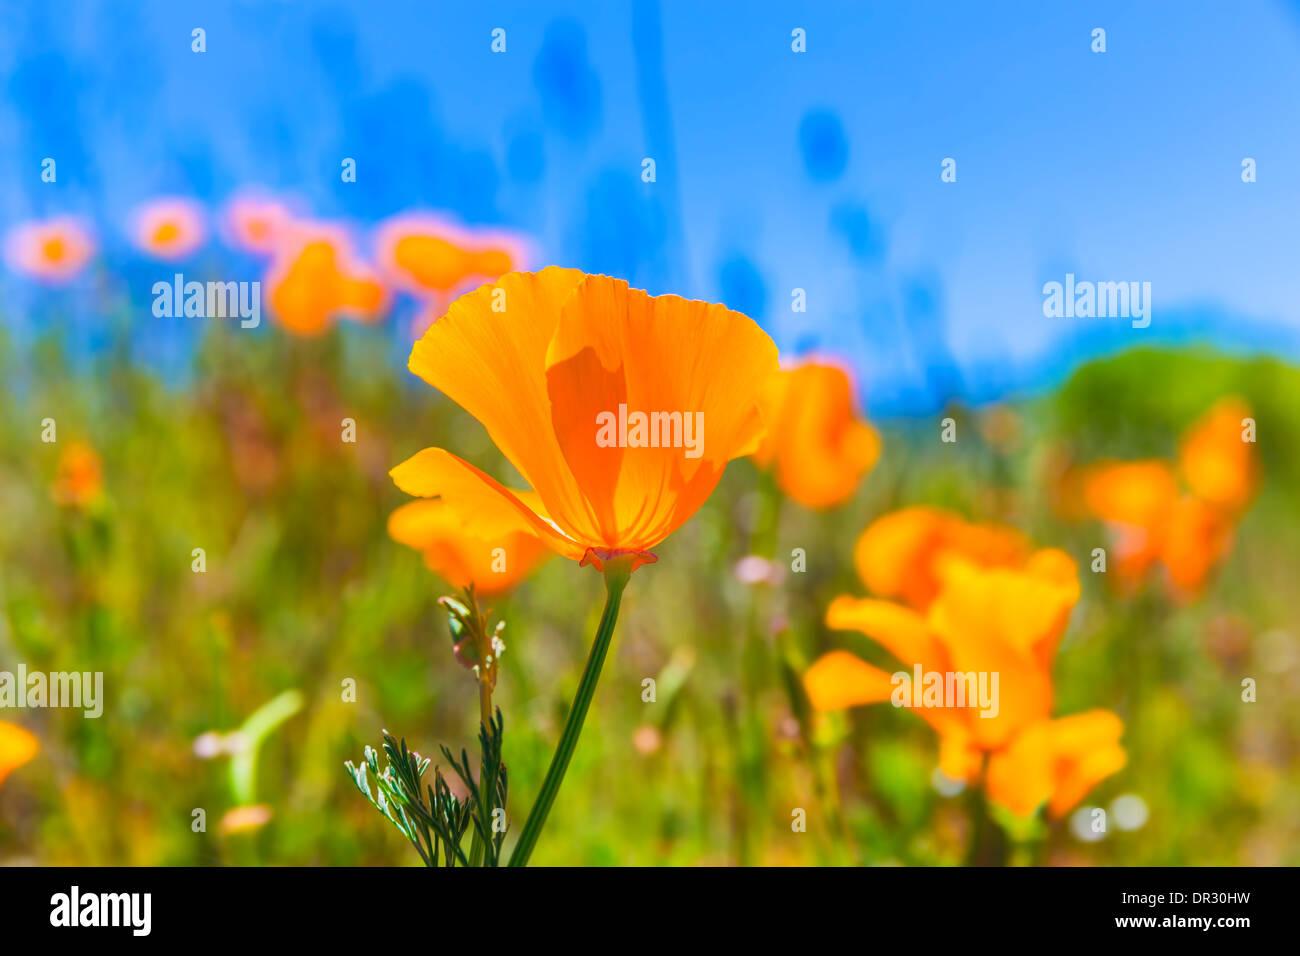 Poppies poppy flowers in orange at california spring fields usa poppies poppy flowers in orange at california spring fields usa mightylinksfo